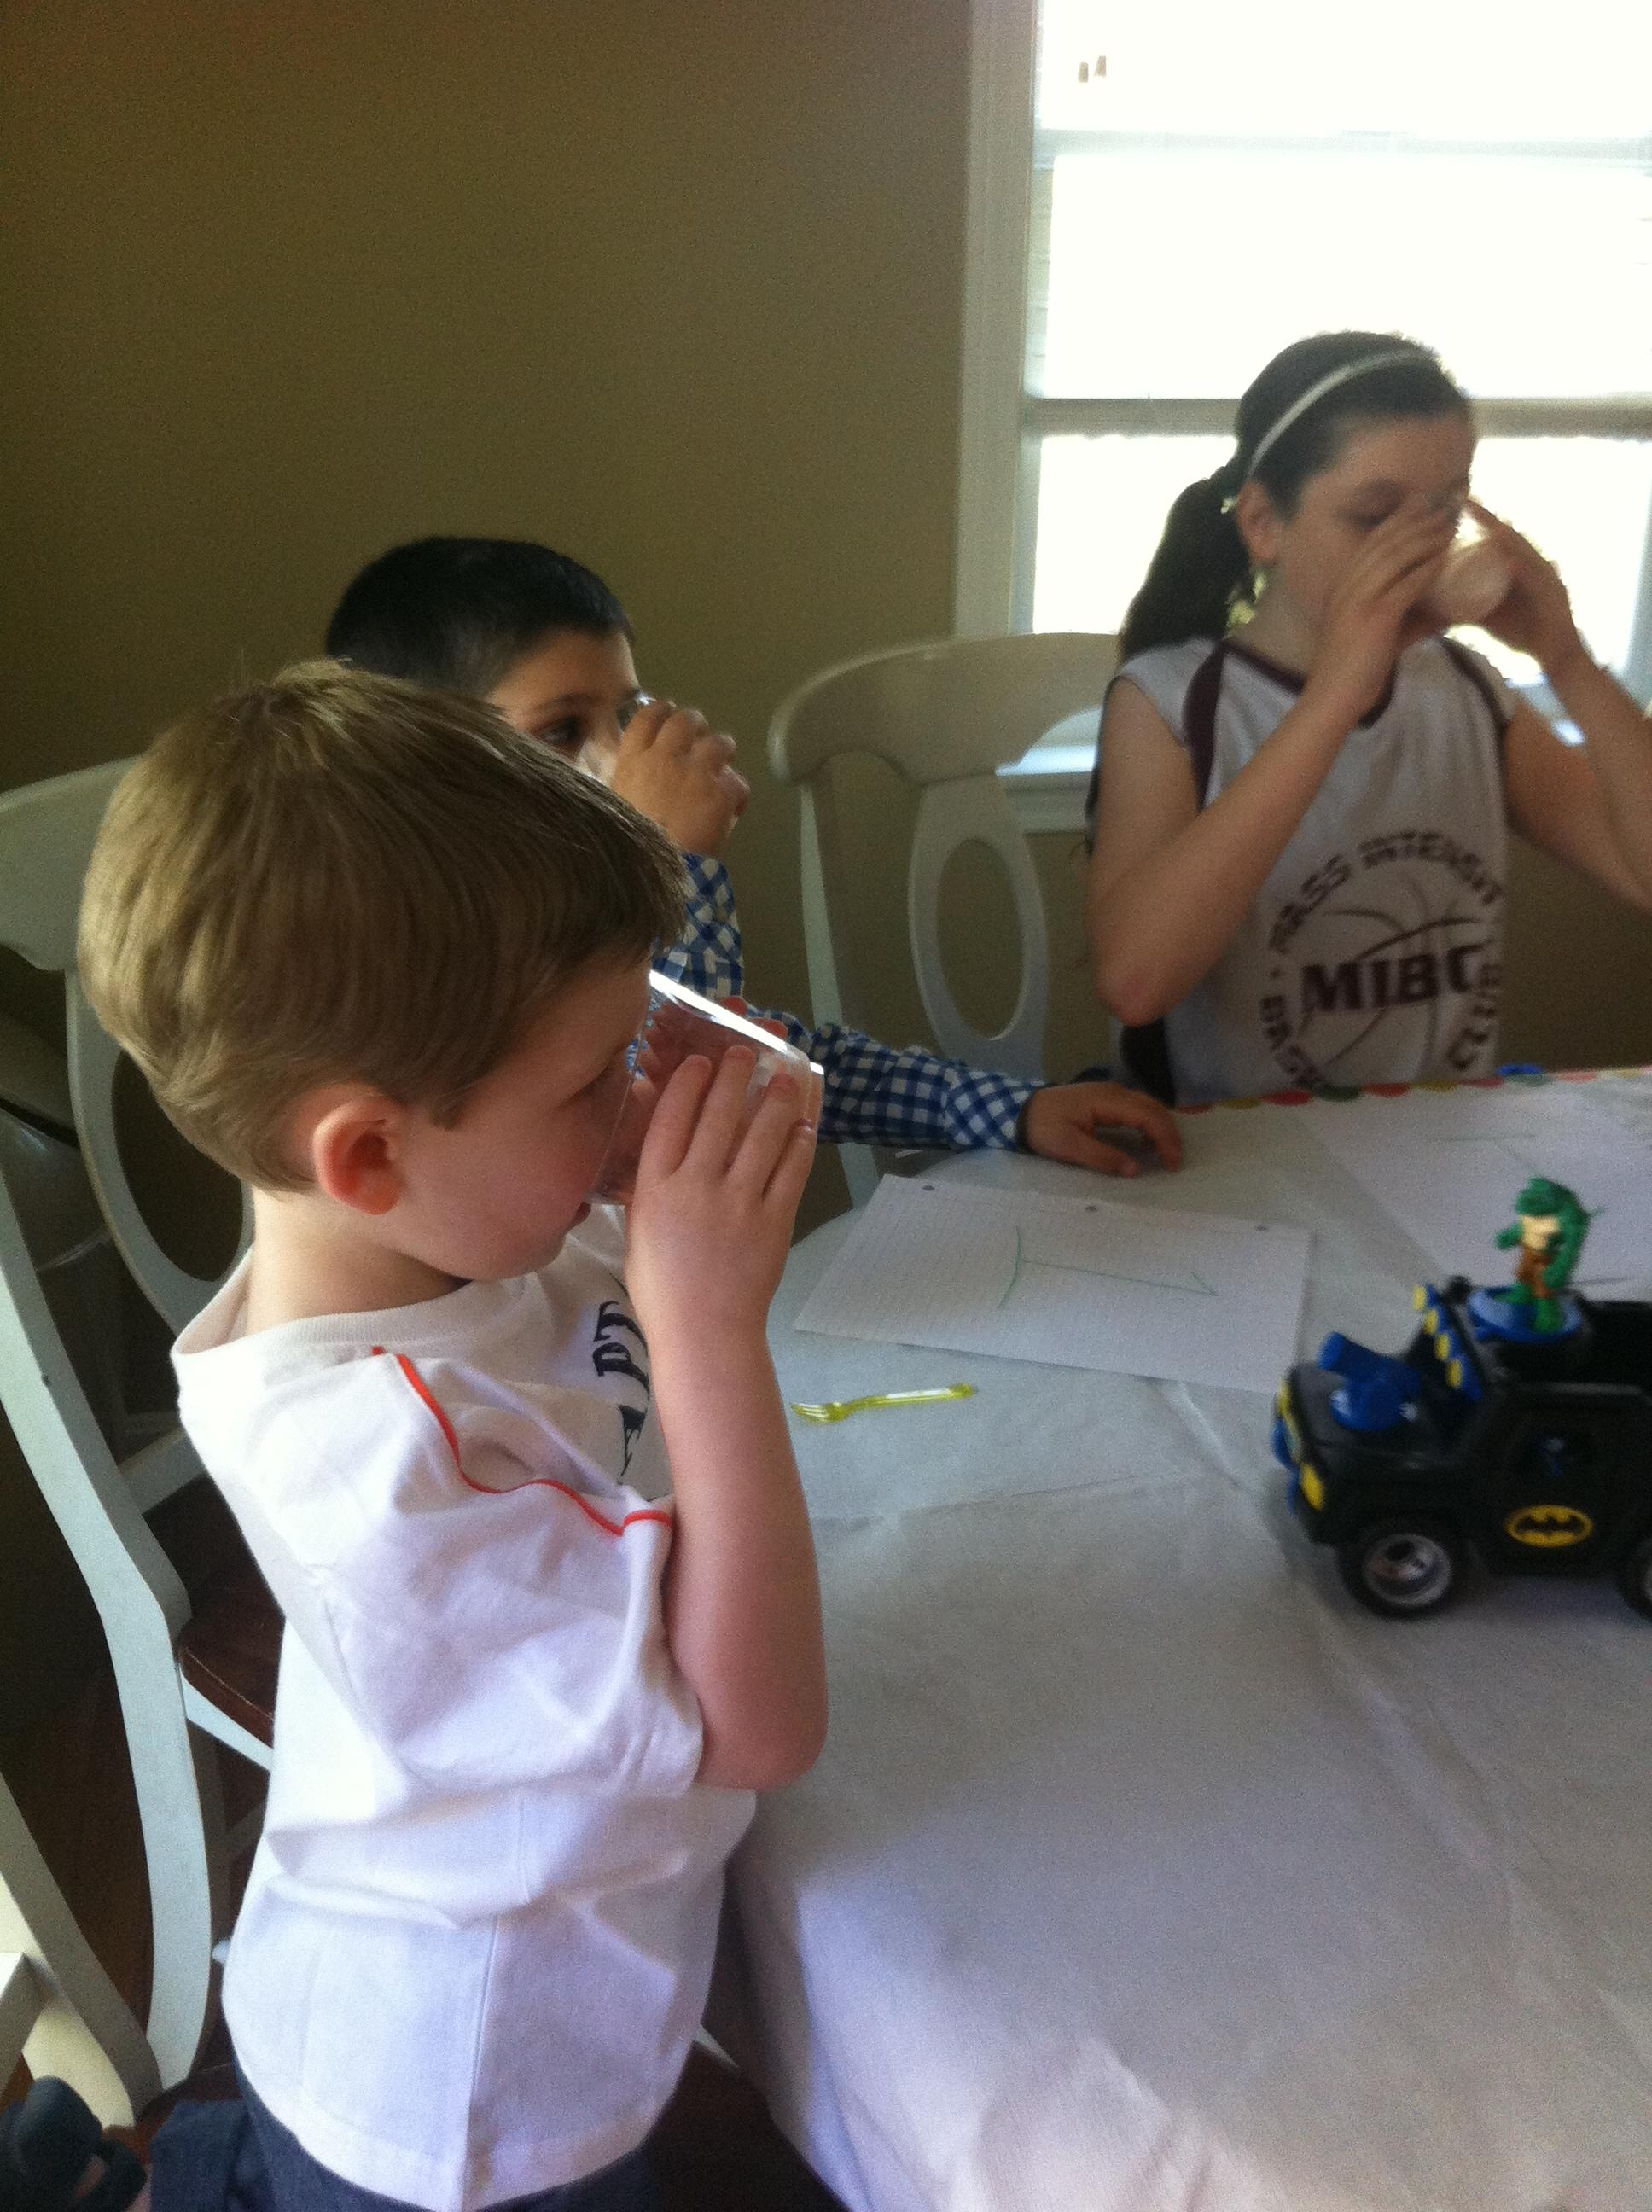 Nice shot of kids drinking smoothies